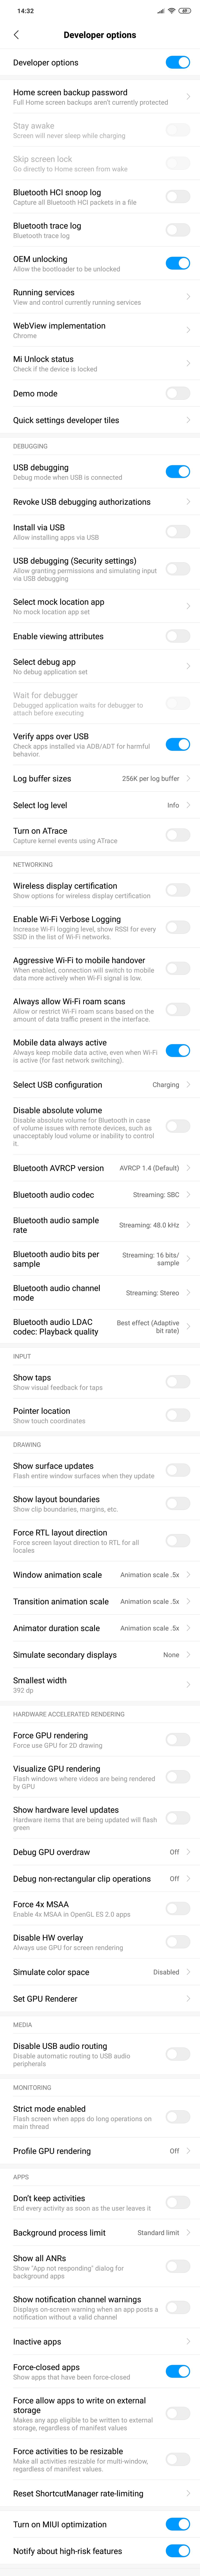 Screenshot_2019-03-01-14-32-48-137_com.android.settings.png